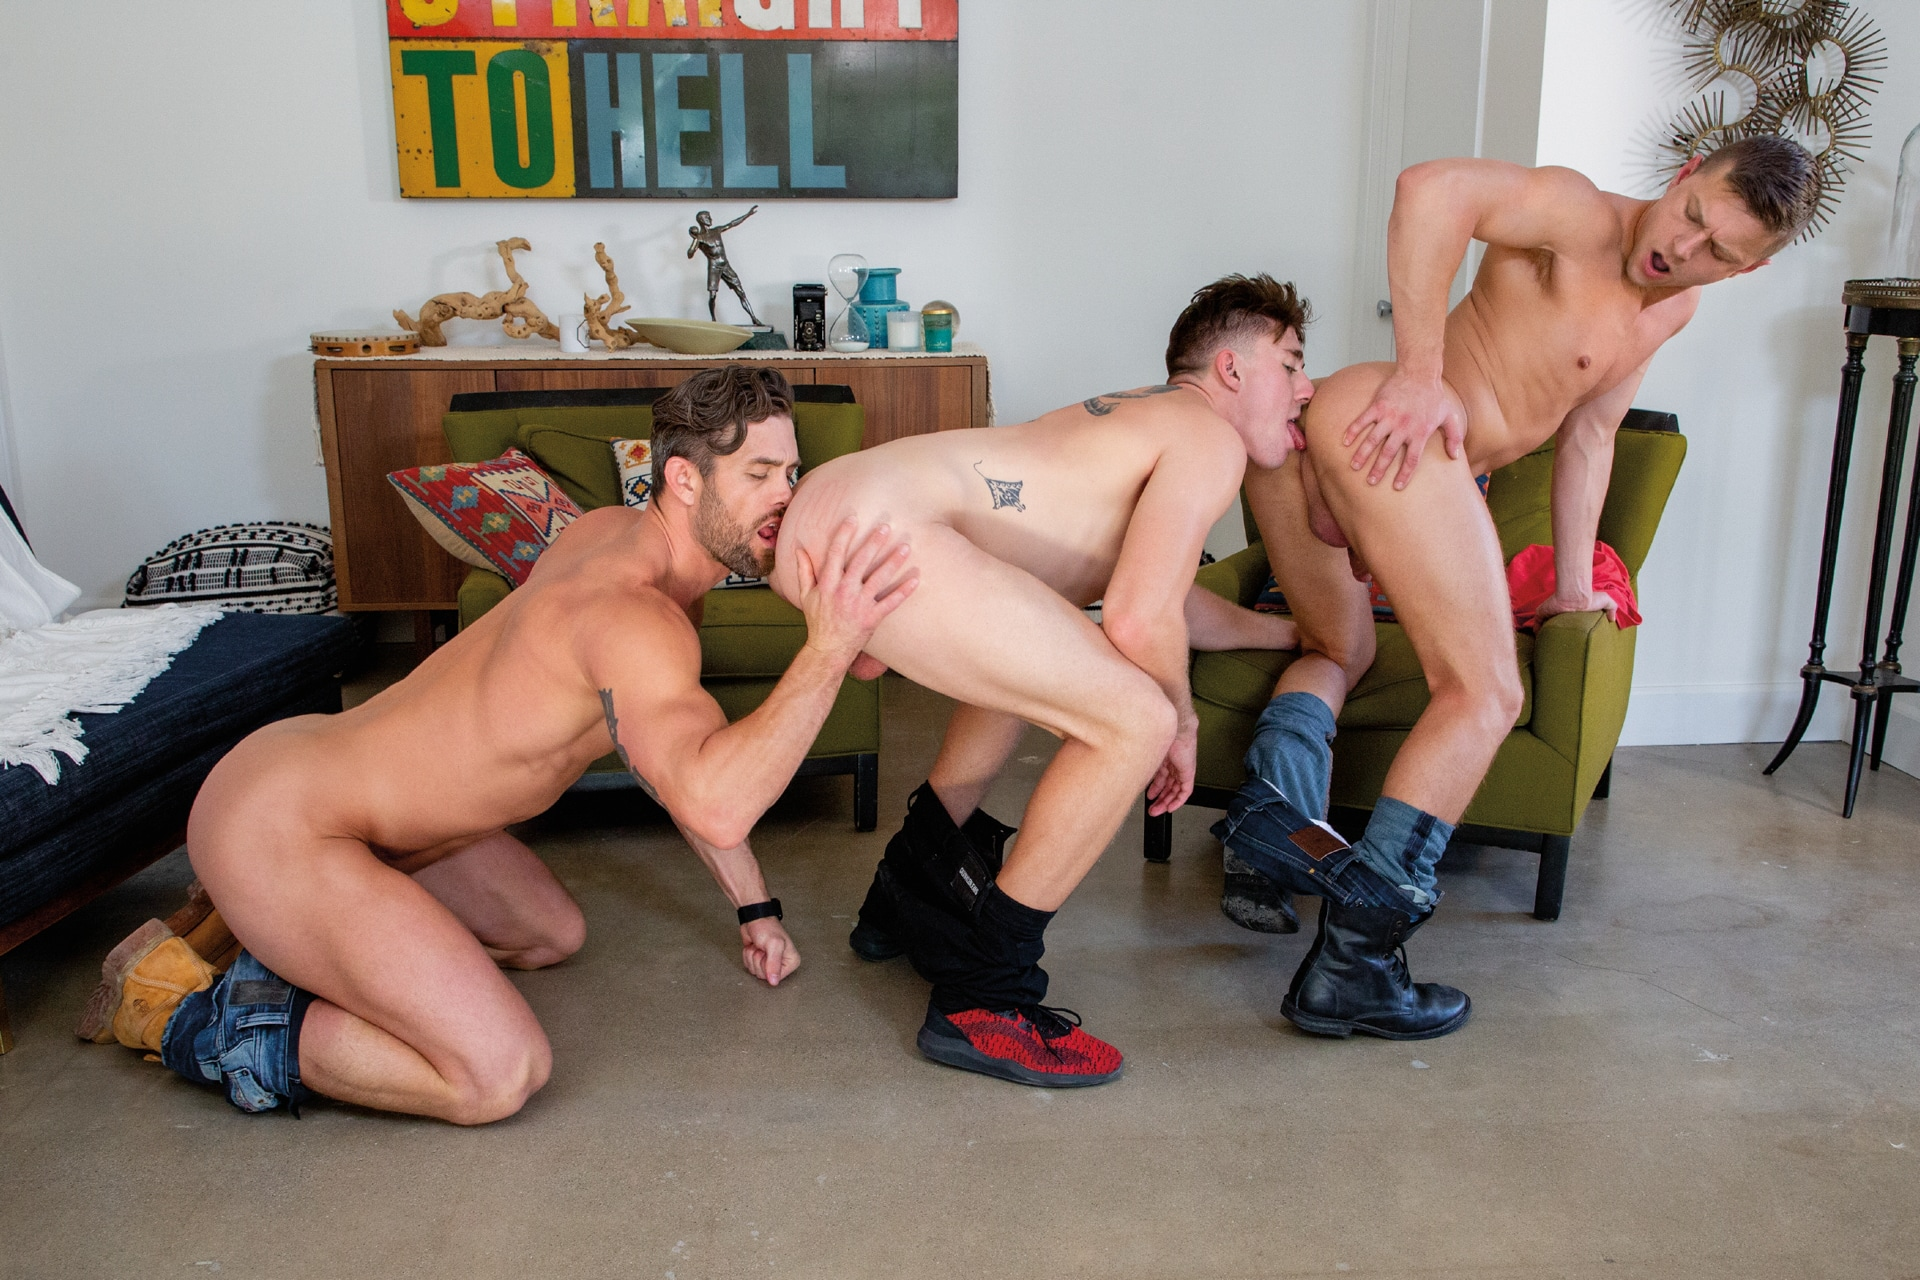 Hot House gay threesome porn